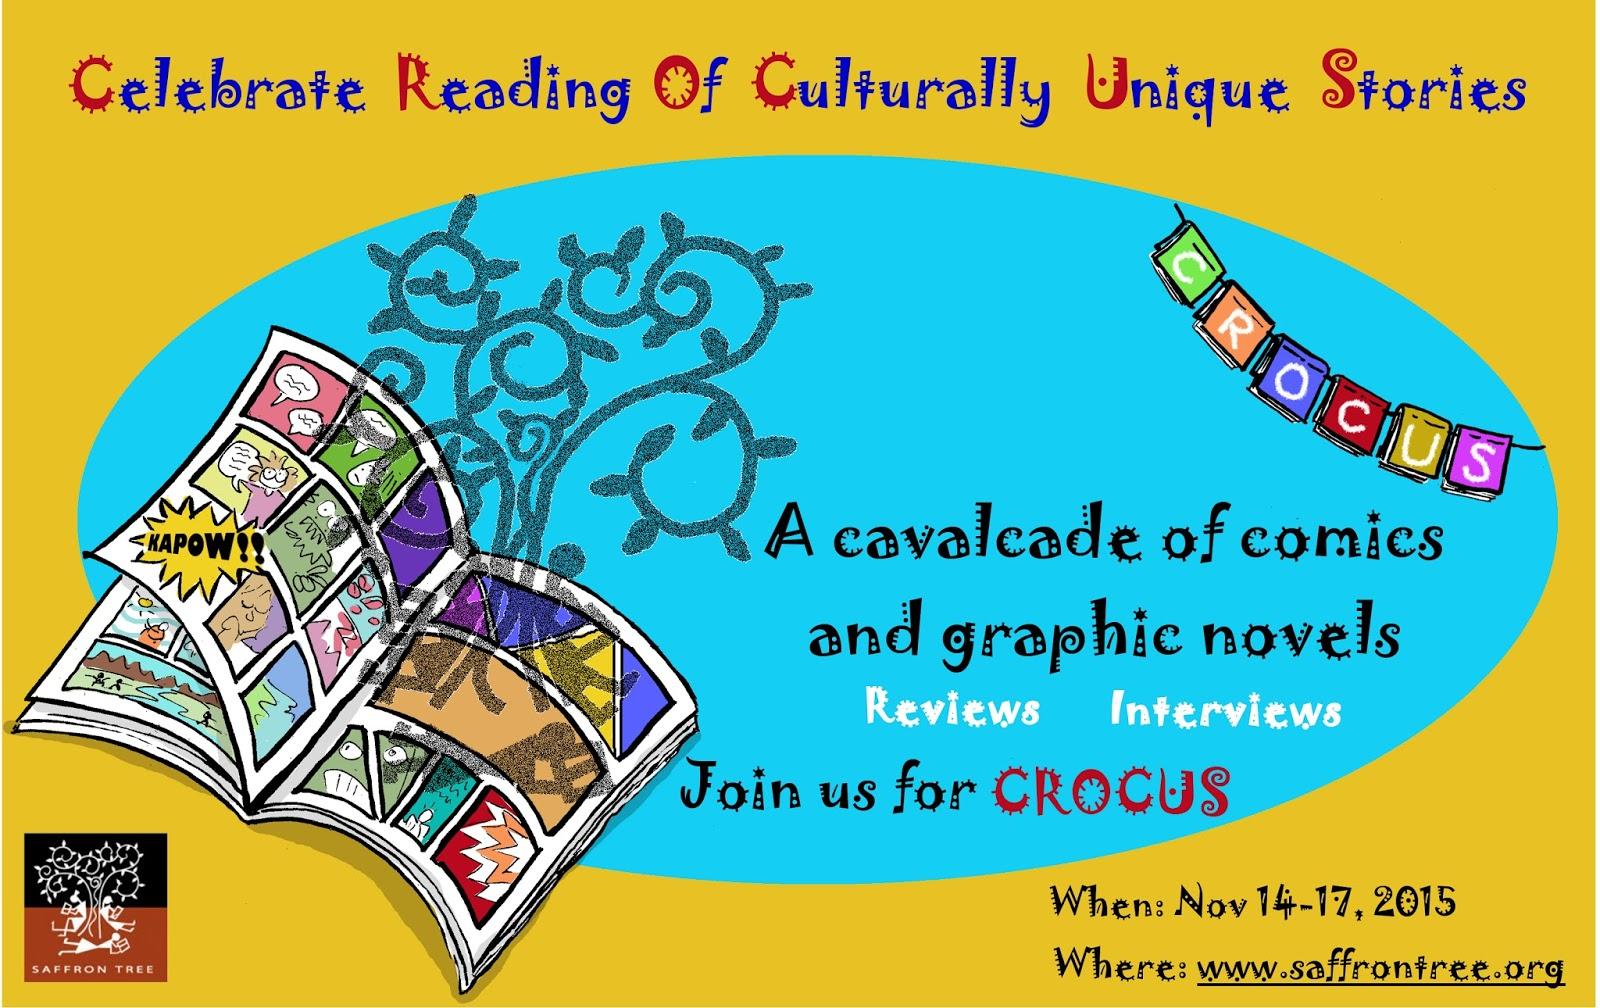 crocus 2015 online book festival